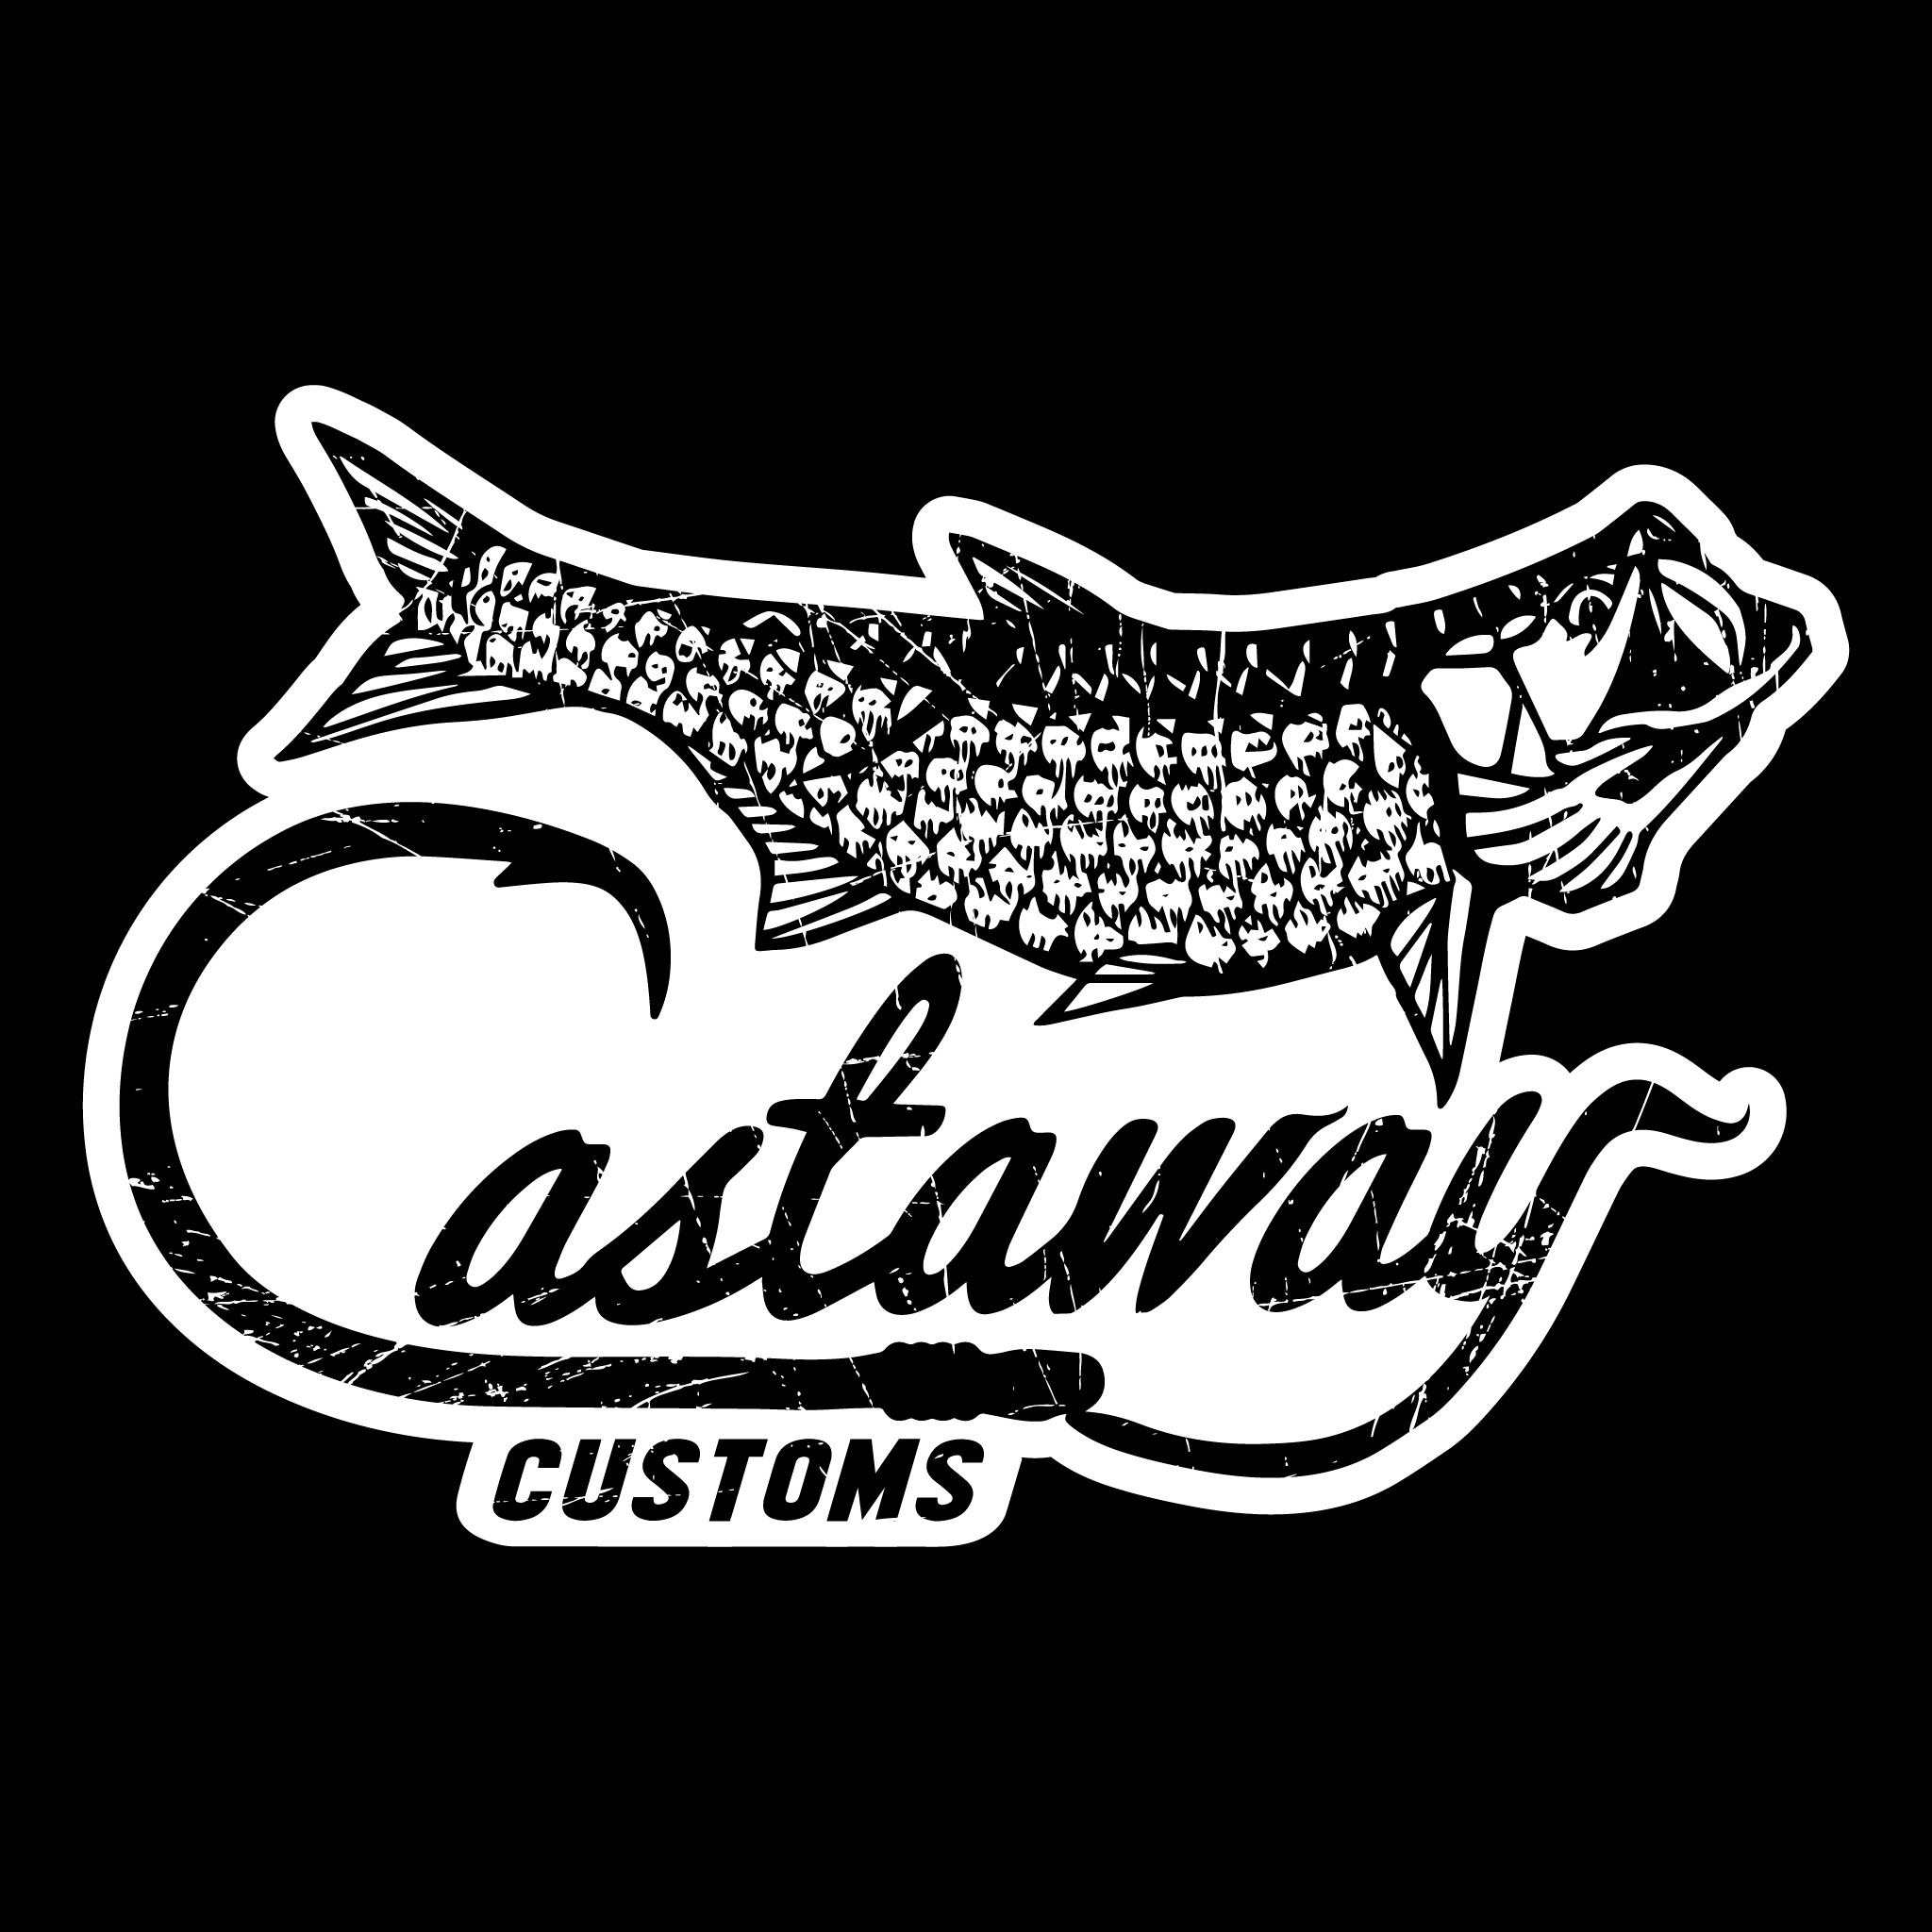 Tarpon logo decal castaway. Clipart ruler short ruler